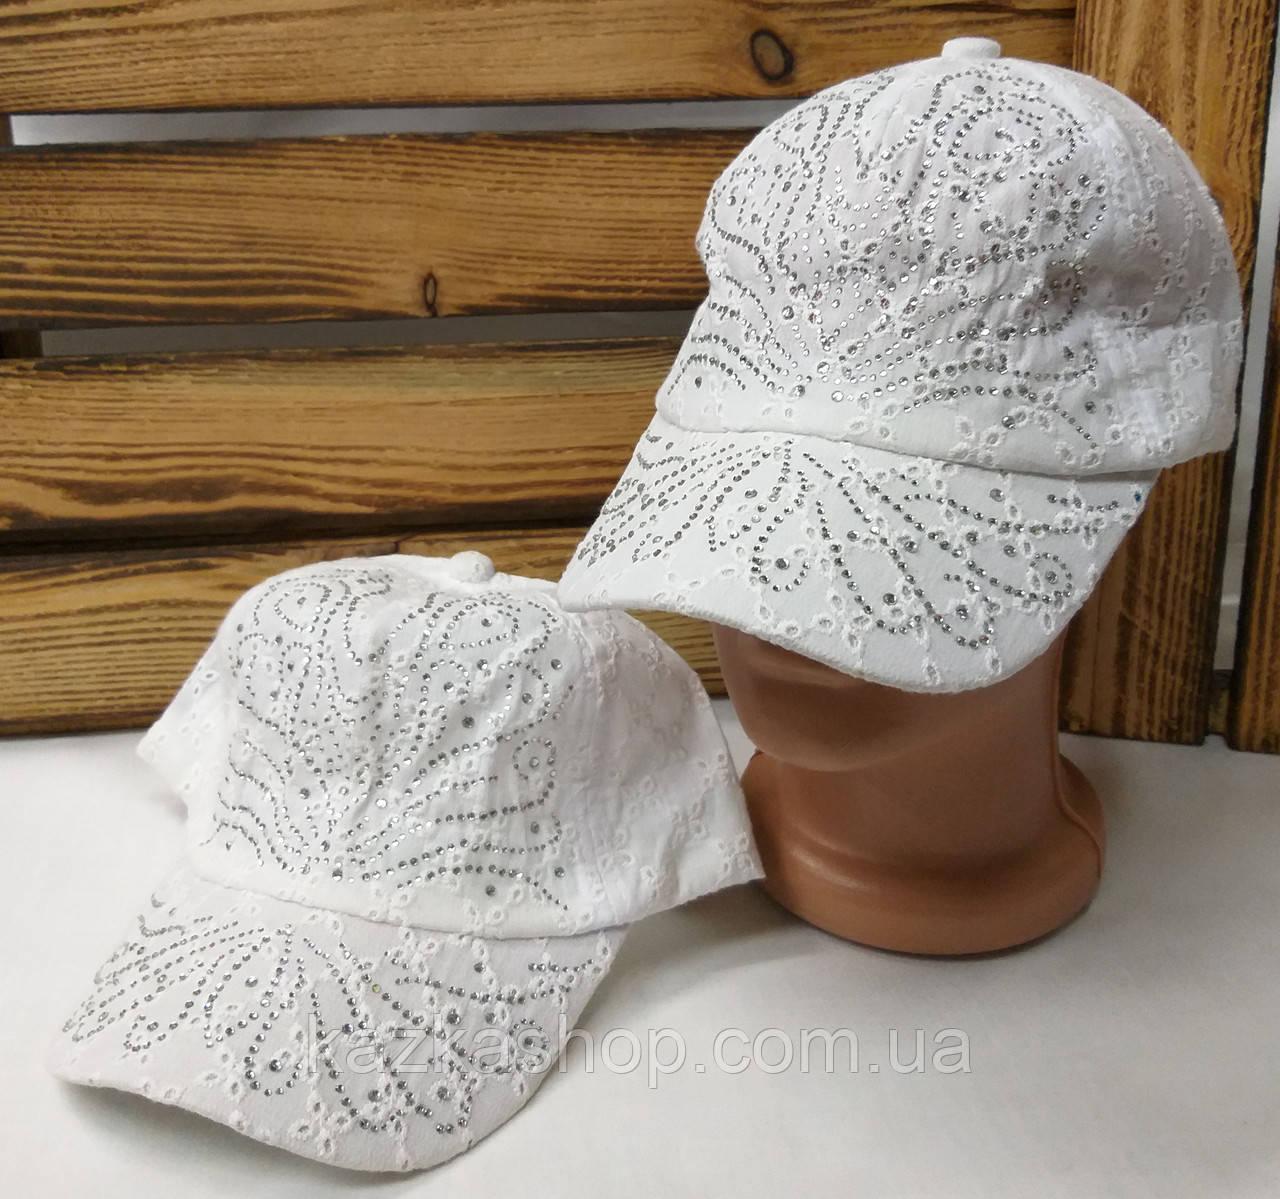 Подростковая тканевая кепка, ткань типа прошва, сезон весна-лето, с регулятором, размер 52-54